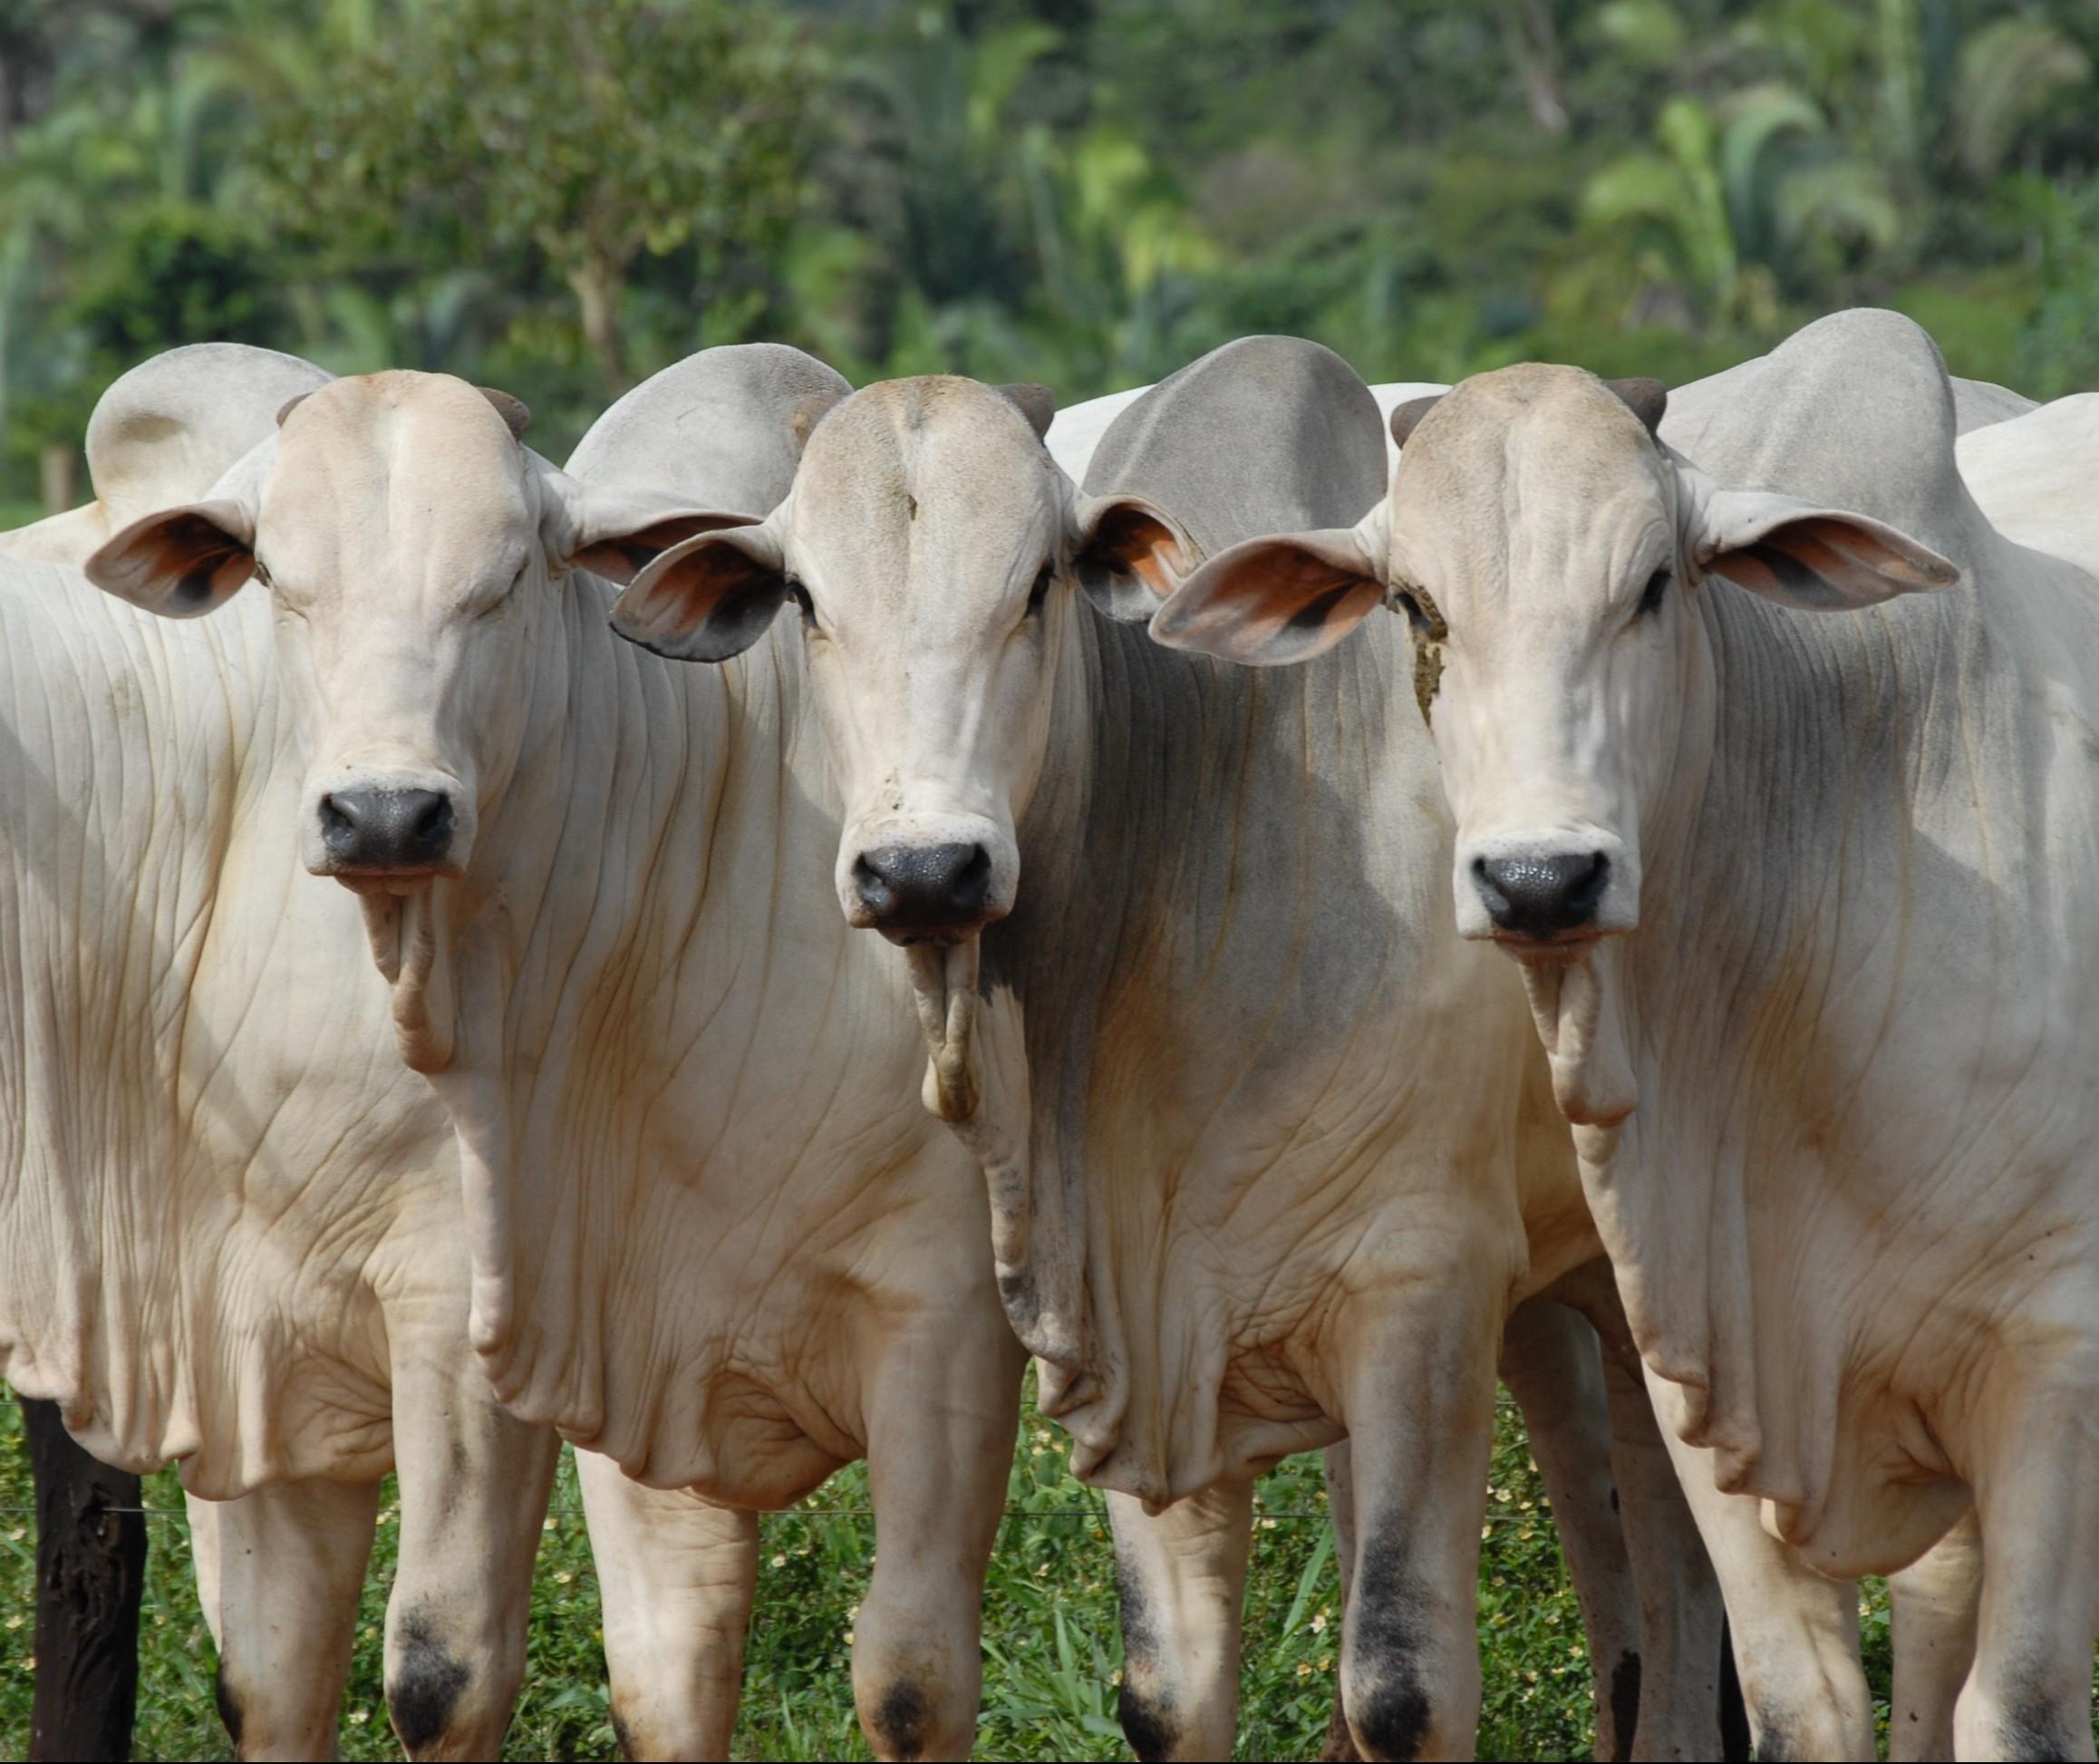 Foco de febre suína é confirmado no Ceará